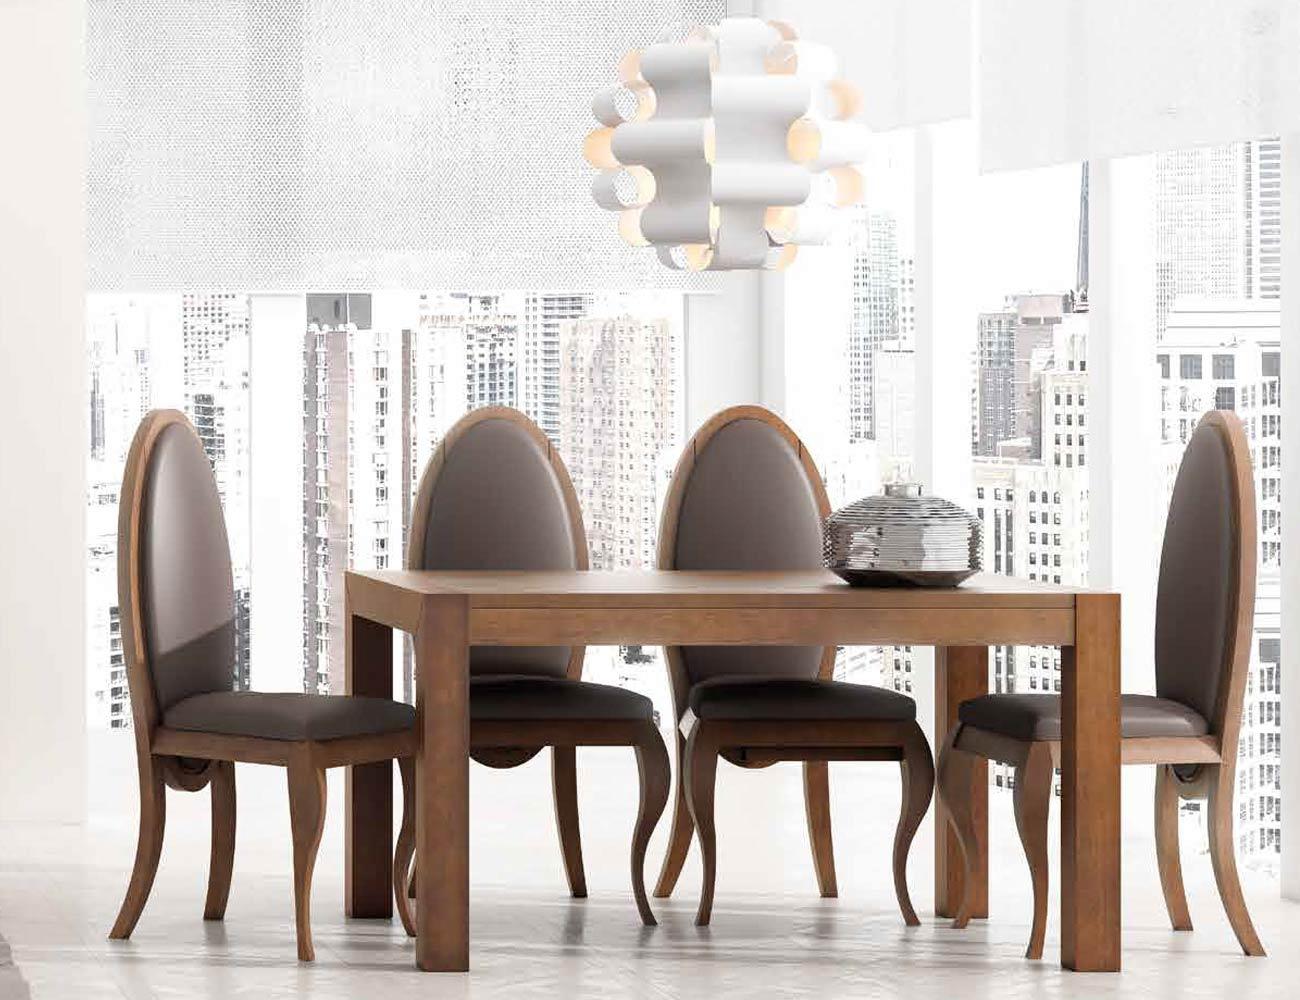 Mesa sillas composicion 16